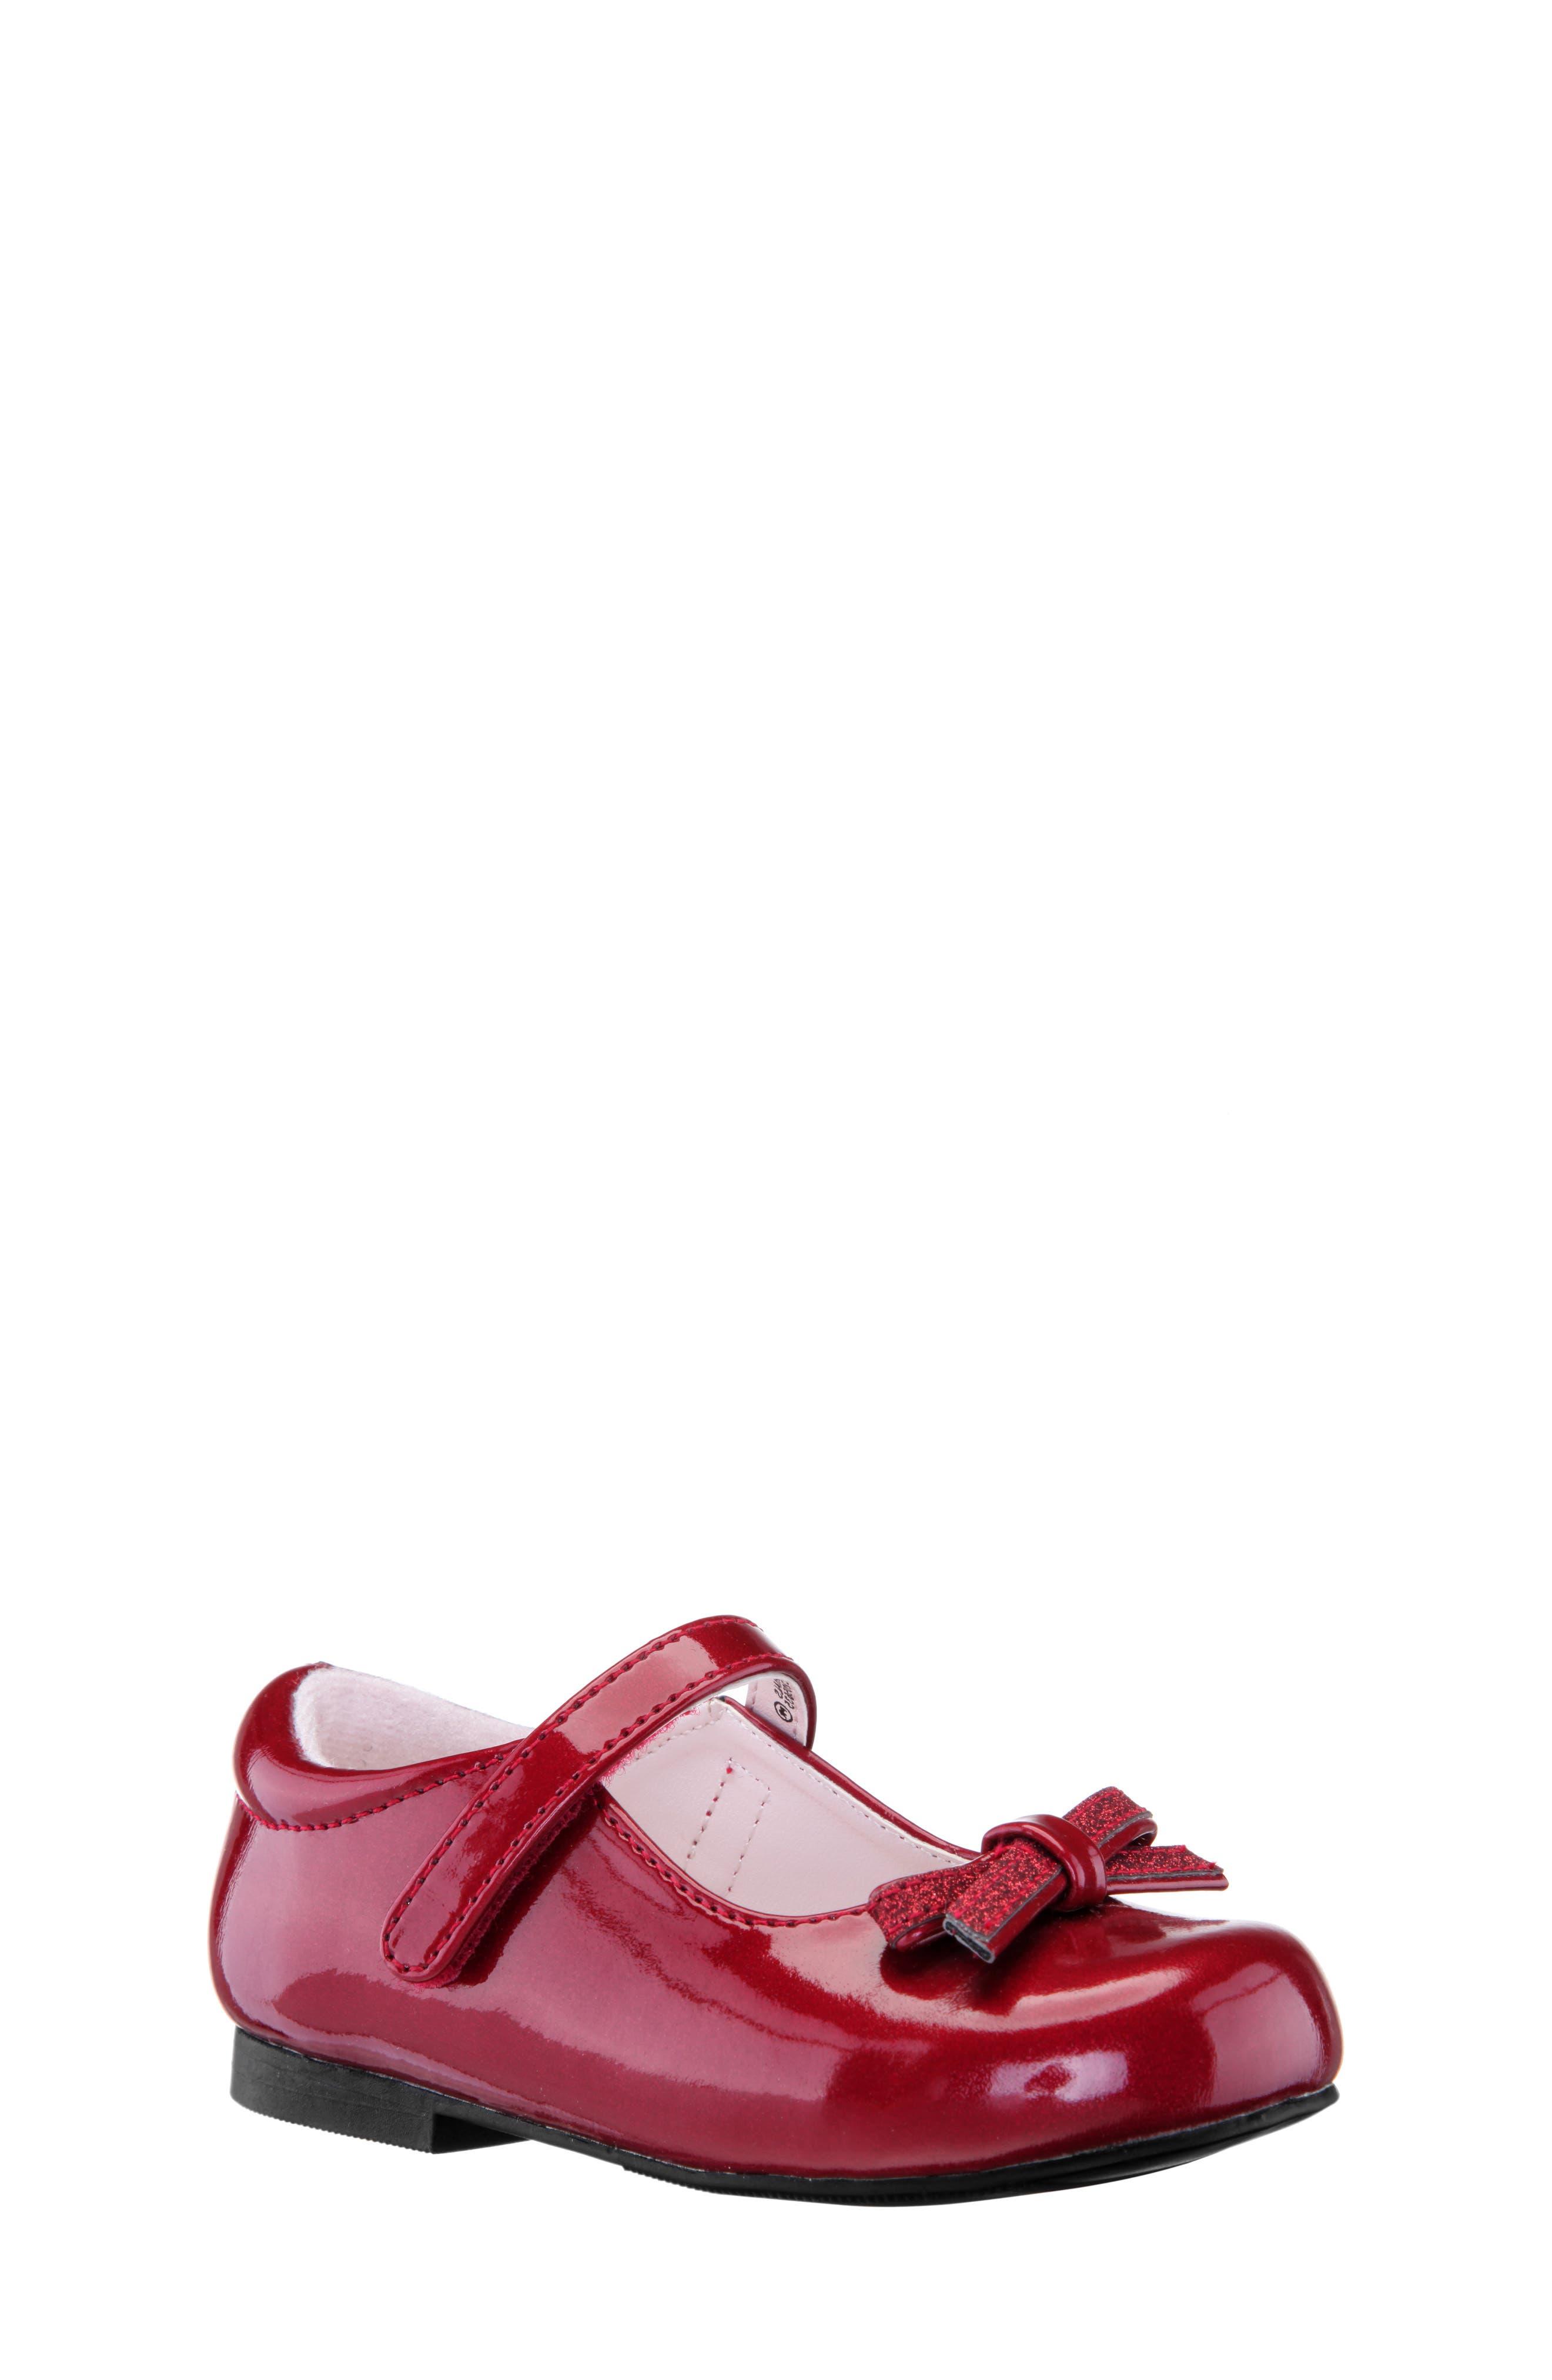 Toddler Girls Nina Christin Glitter Bow Mary Jane Size 6 M  Red